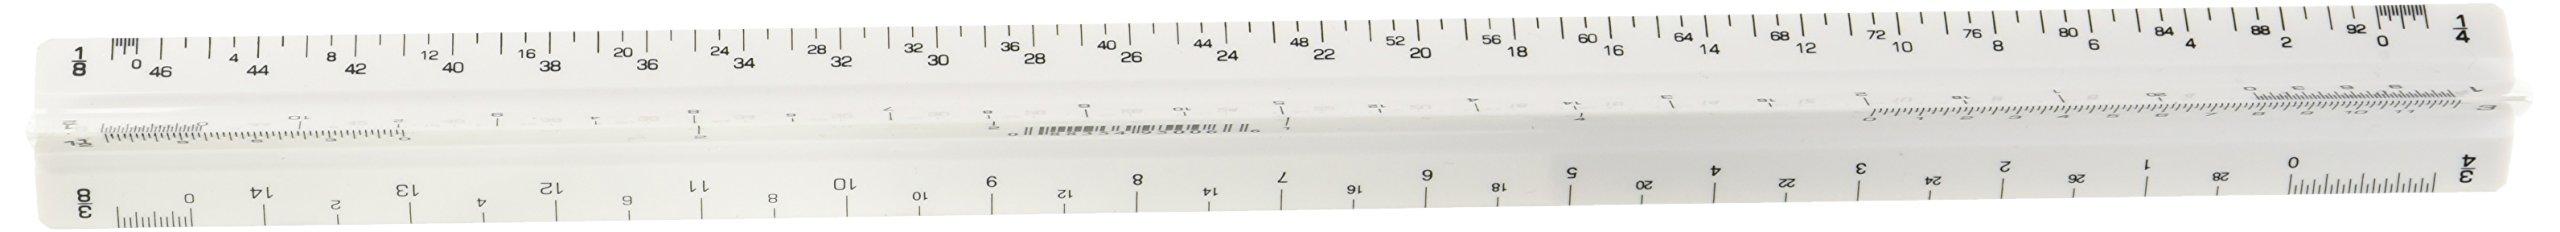 Alvin 110P 110 Series 12'' High Impact Plastic Architect Triangular Scale by Alvin (Image #2)